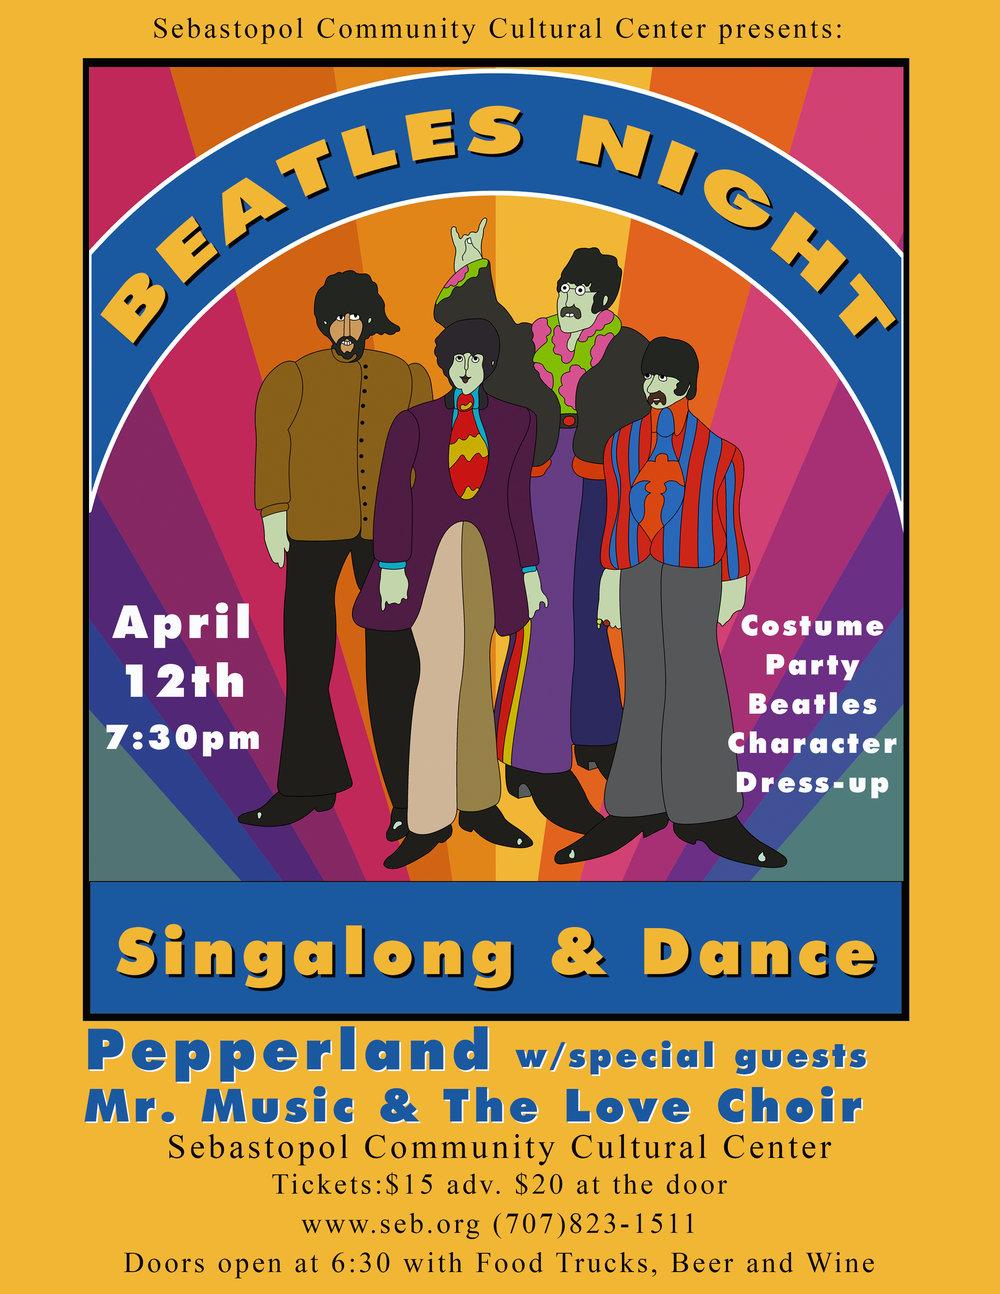 Pepperland and Friends w/ Mr. Music & Love Choir